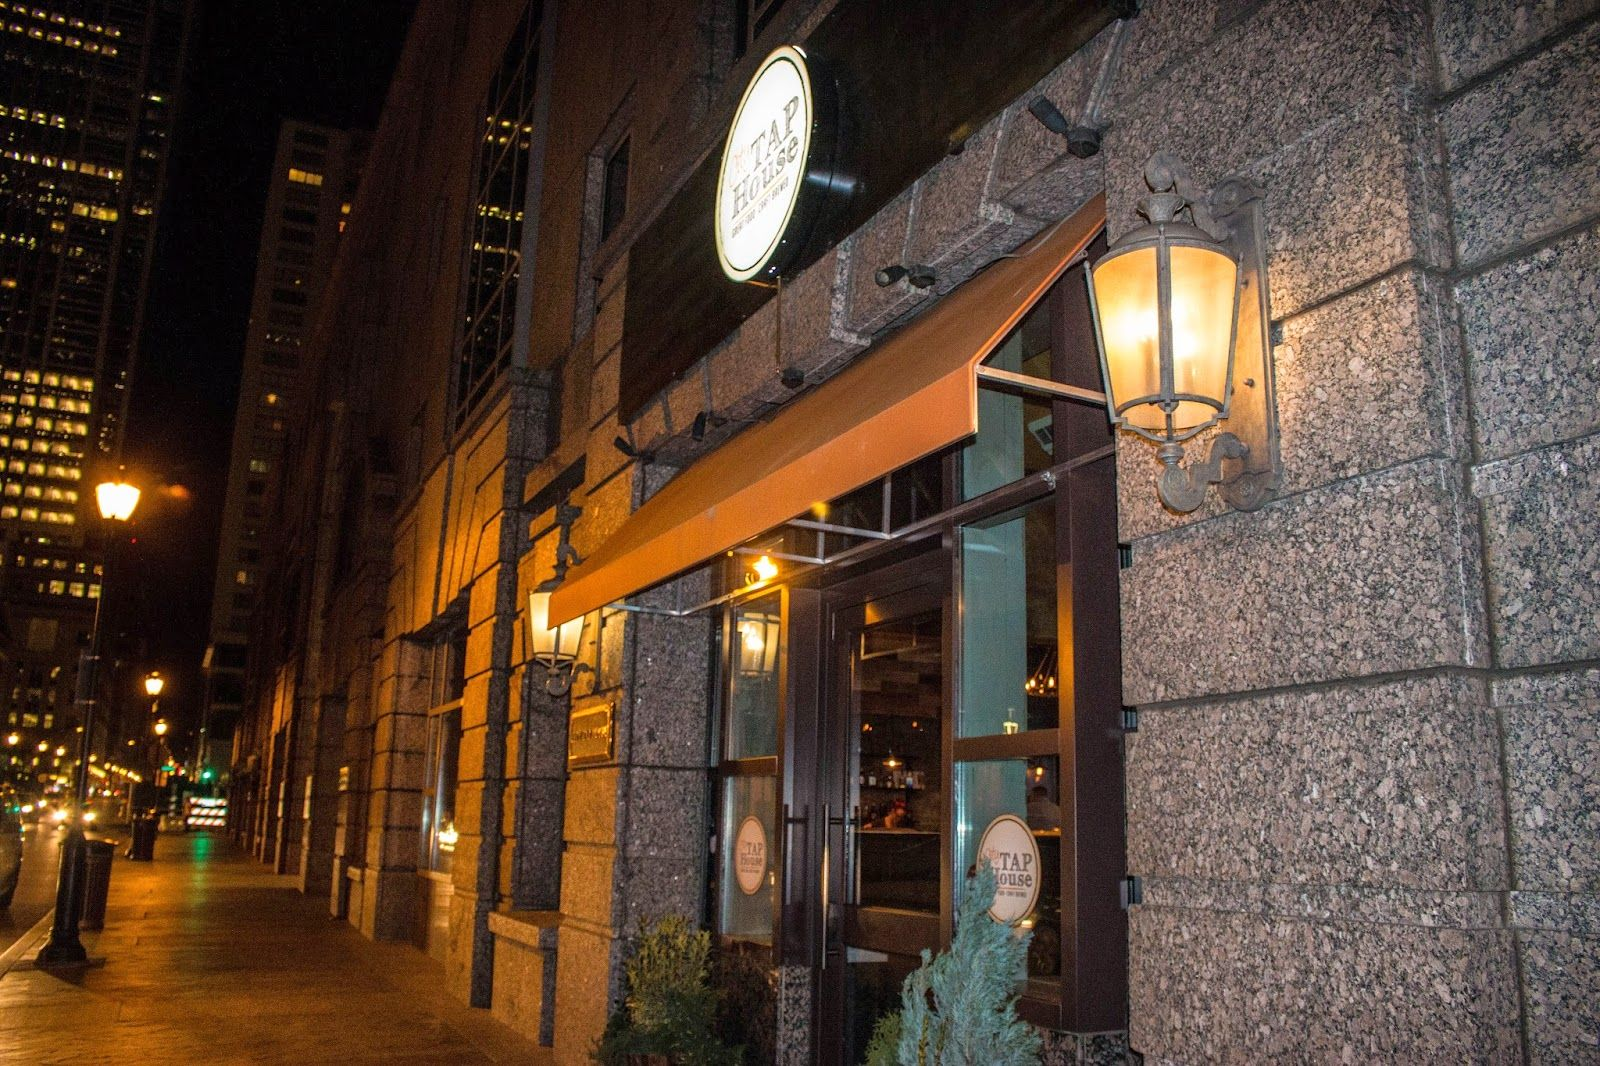 City Tap House Logan Square Review Logan square, City